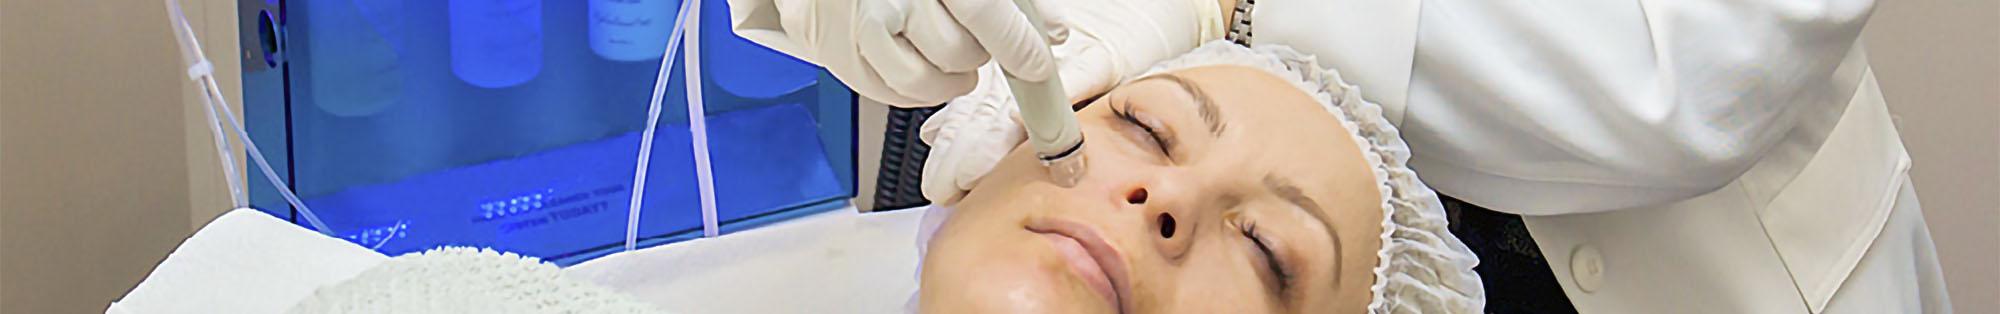 Hydra Facial ihonhoito | Kauneushoitola Pioni - Oulu